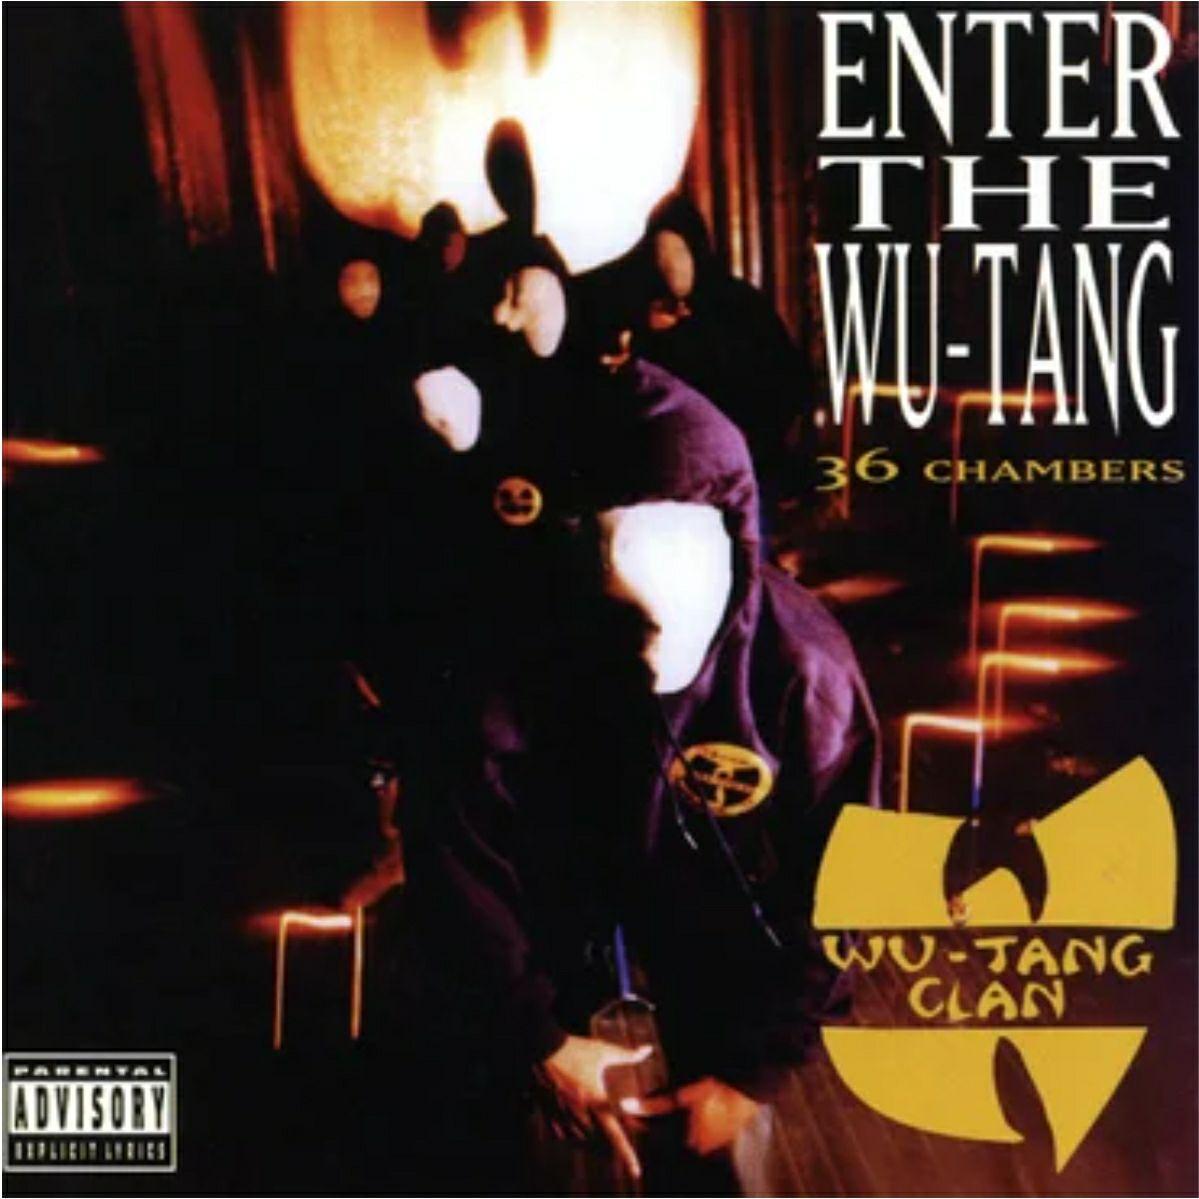 Enter The Wu Tang (36 Chambers) Vinyl Wu Tang Clan - £12.99 (+£3.51 Postage) @ Rough Trade